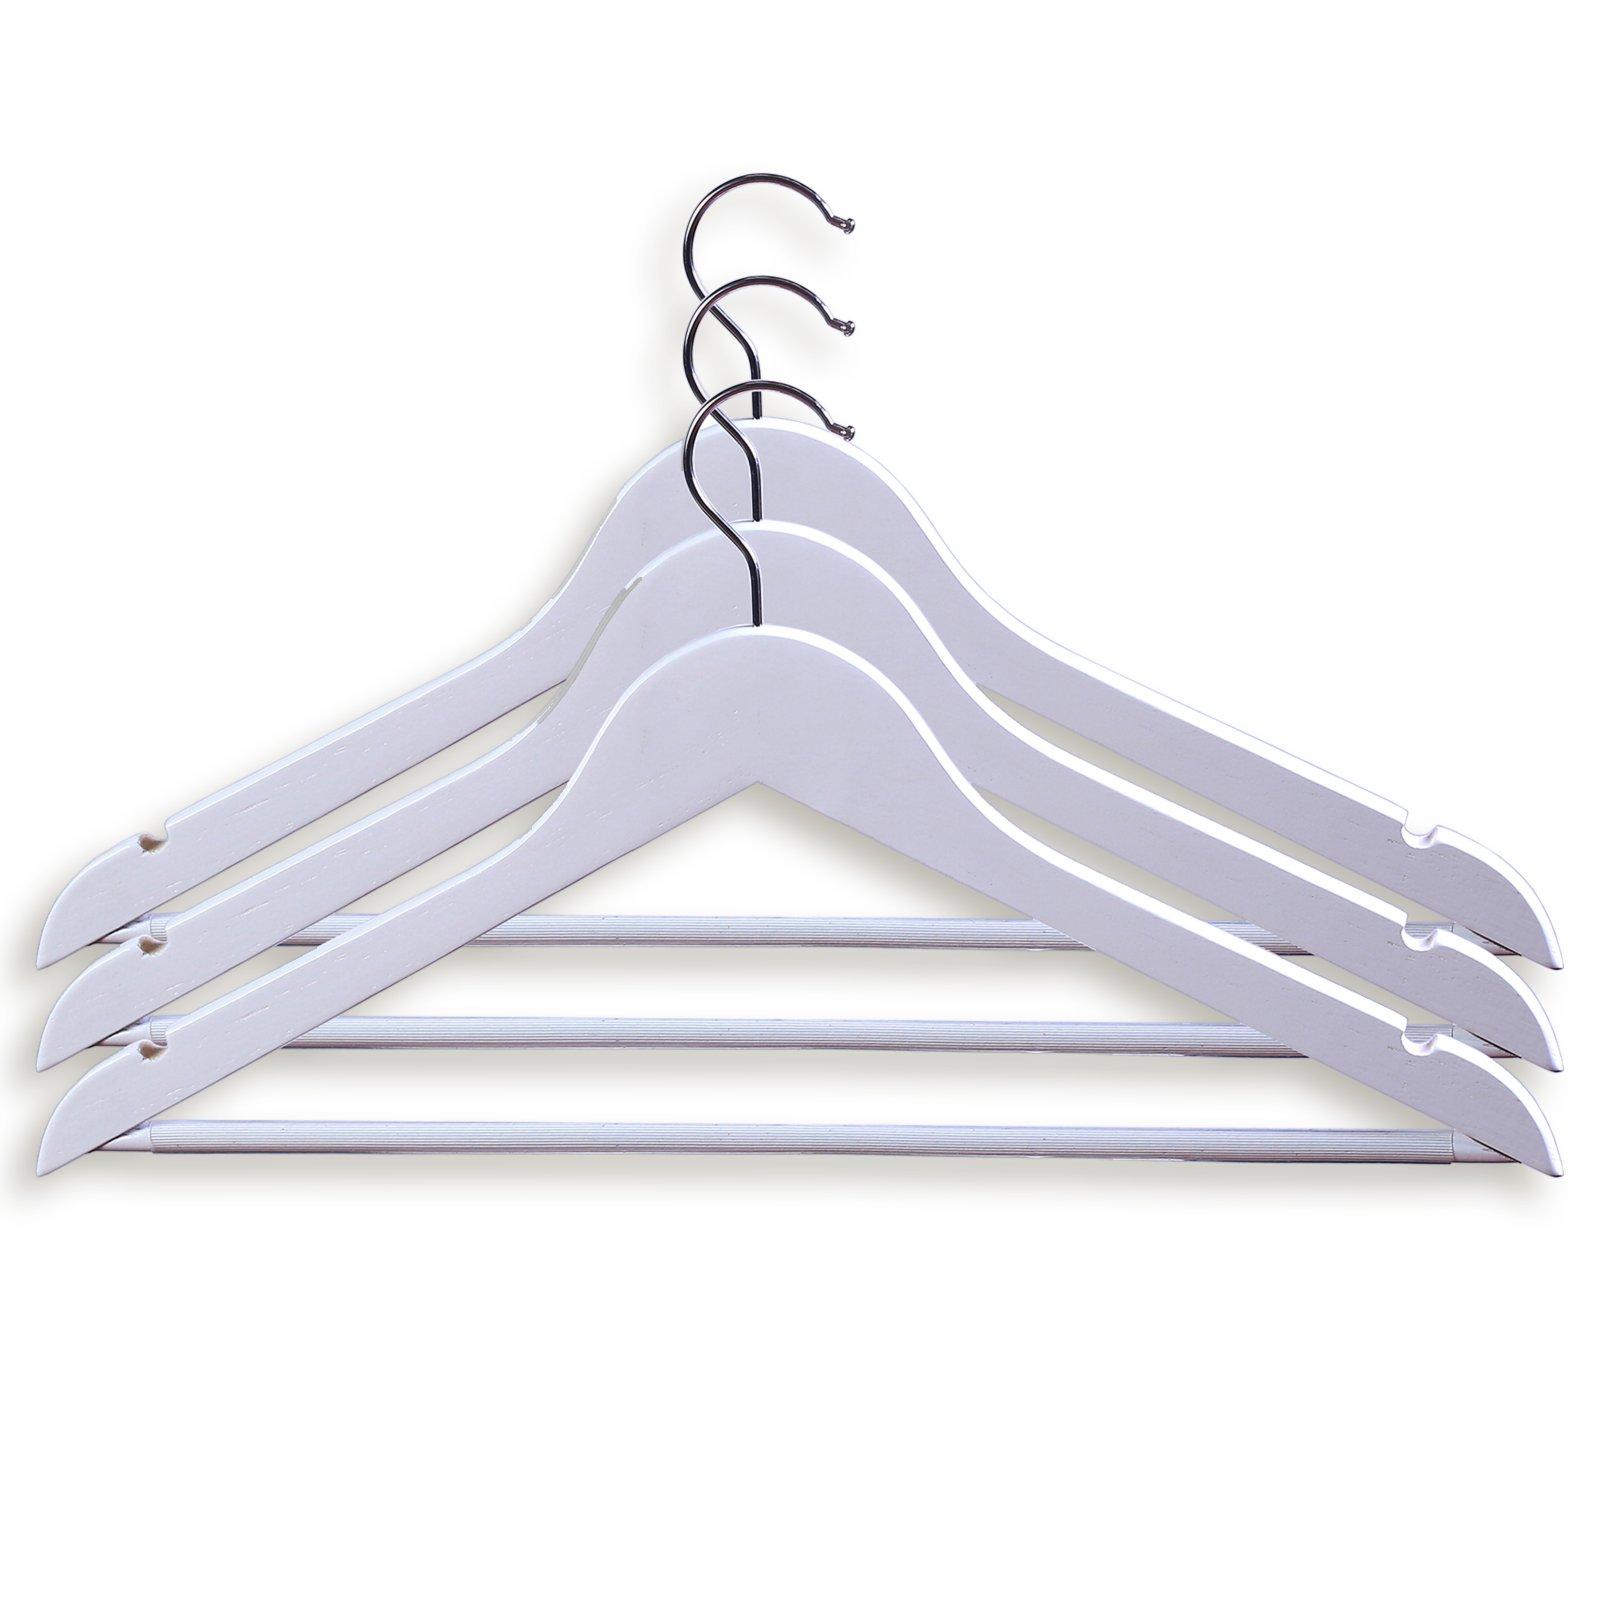 3-teiliges Kleiderbügel-Set - weiß - mit Hosensteg | Kleiderbügel ...